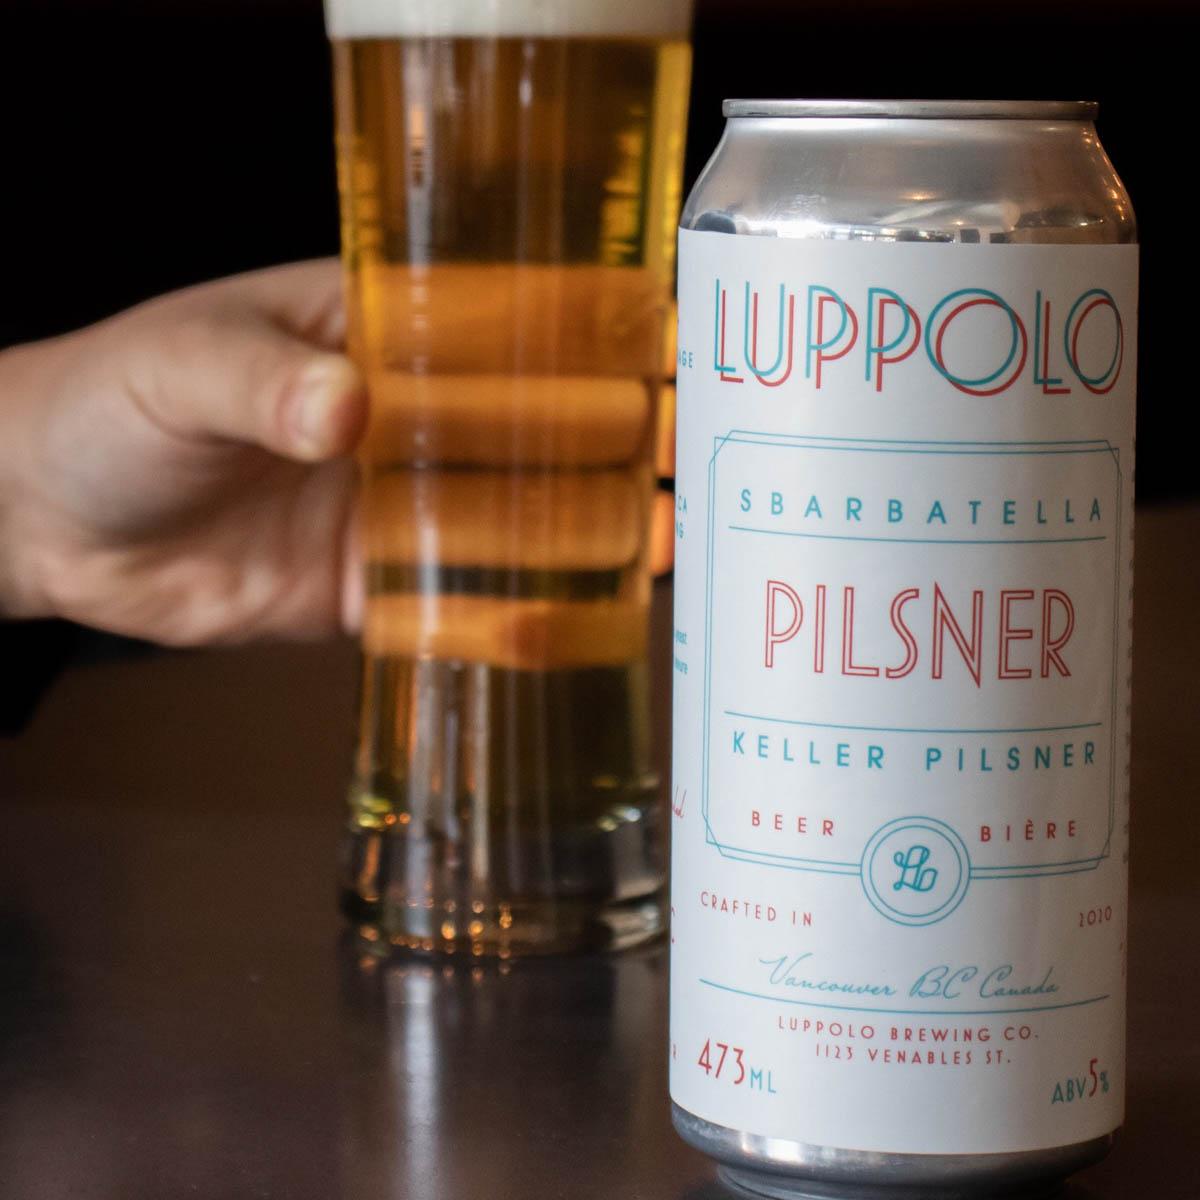 Sbarbatella-Keller-Pilsner-Luppolo-Brewing-Company-Vancouver